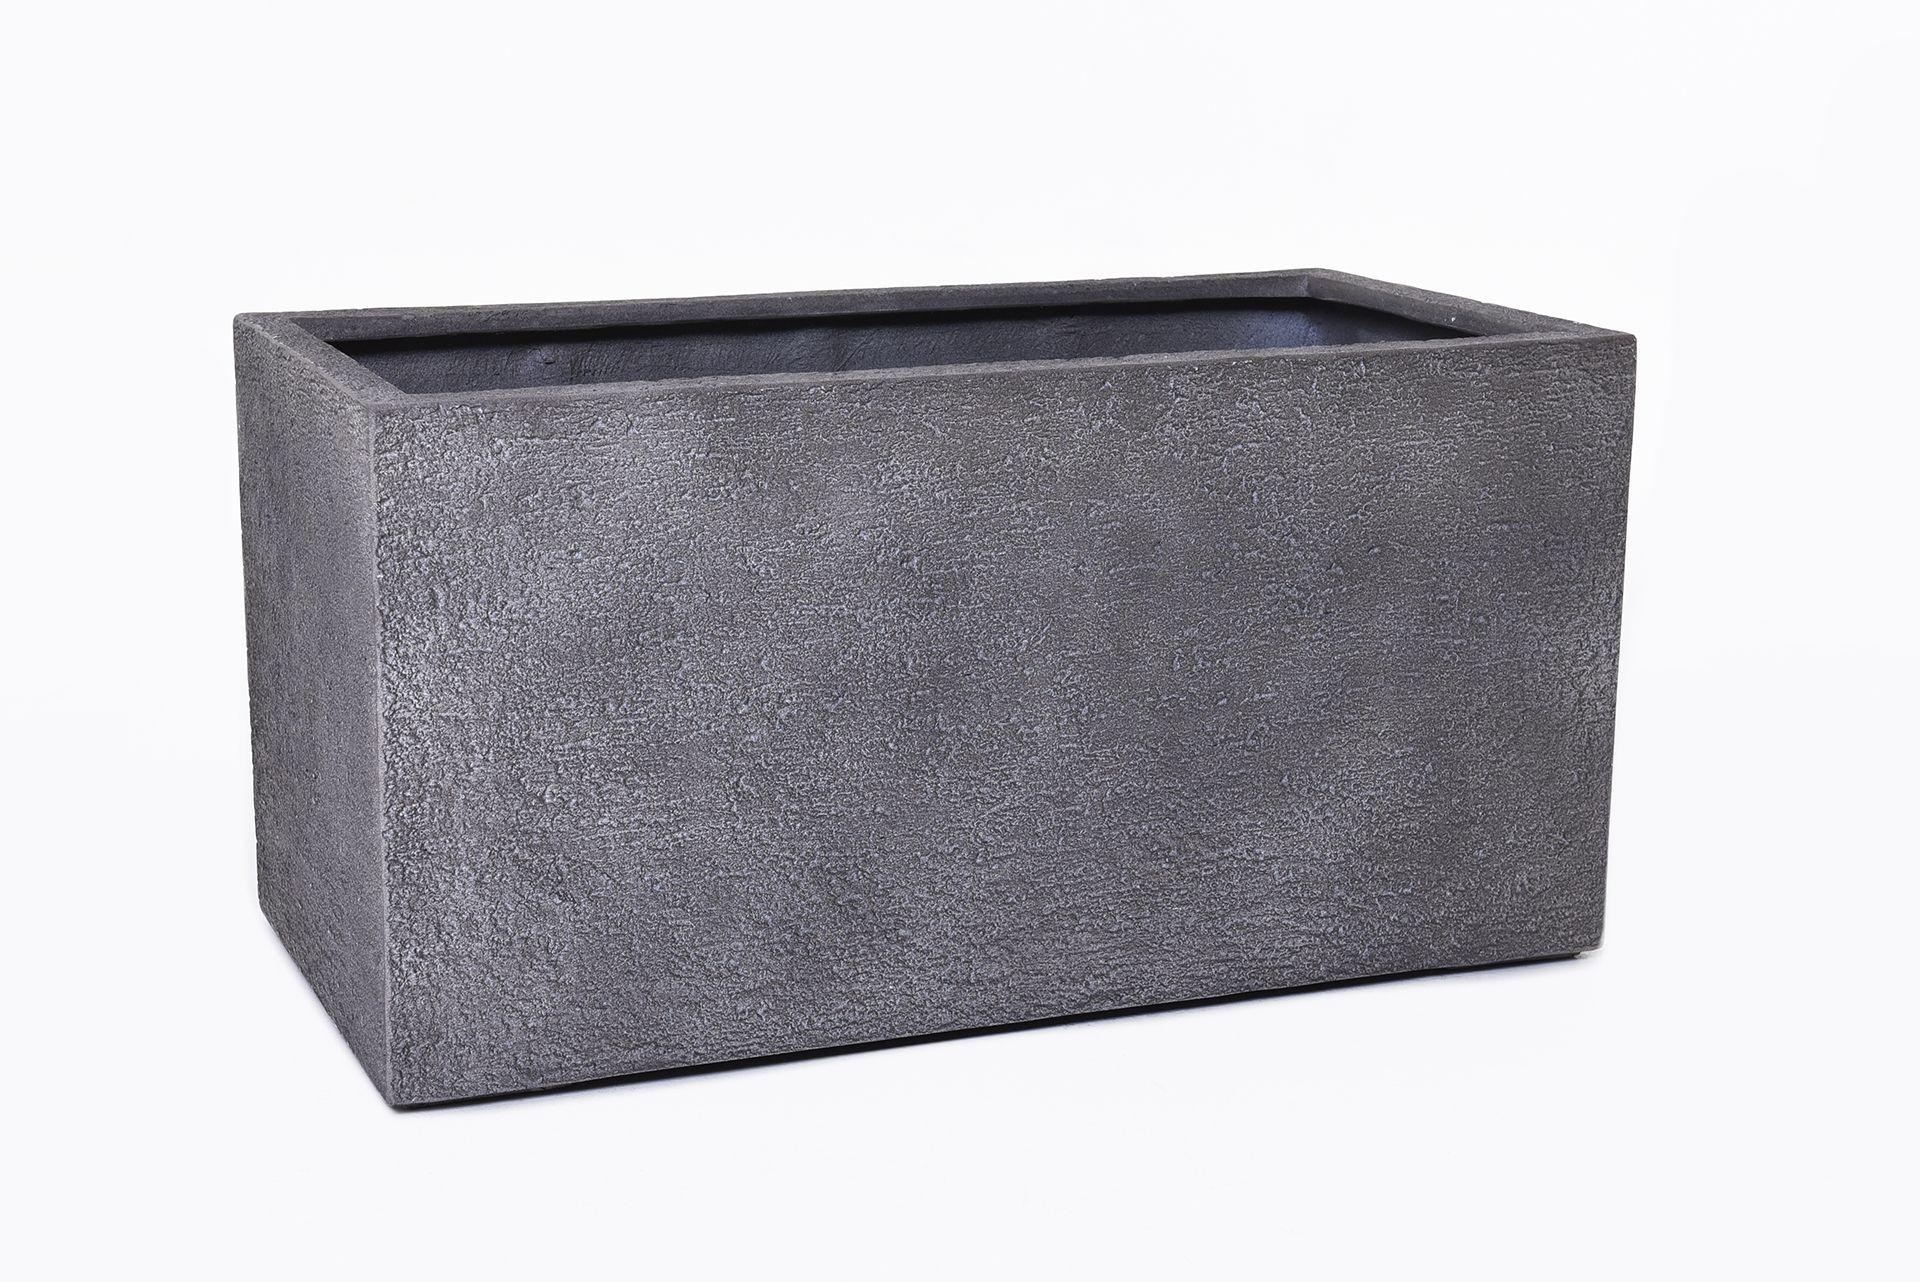 pflanzk bel pflanztrog fiberglas steinoptik maxi 80 cm grau ebay. Black Bedroom Furniture Sets. Home Design Ideas